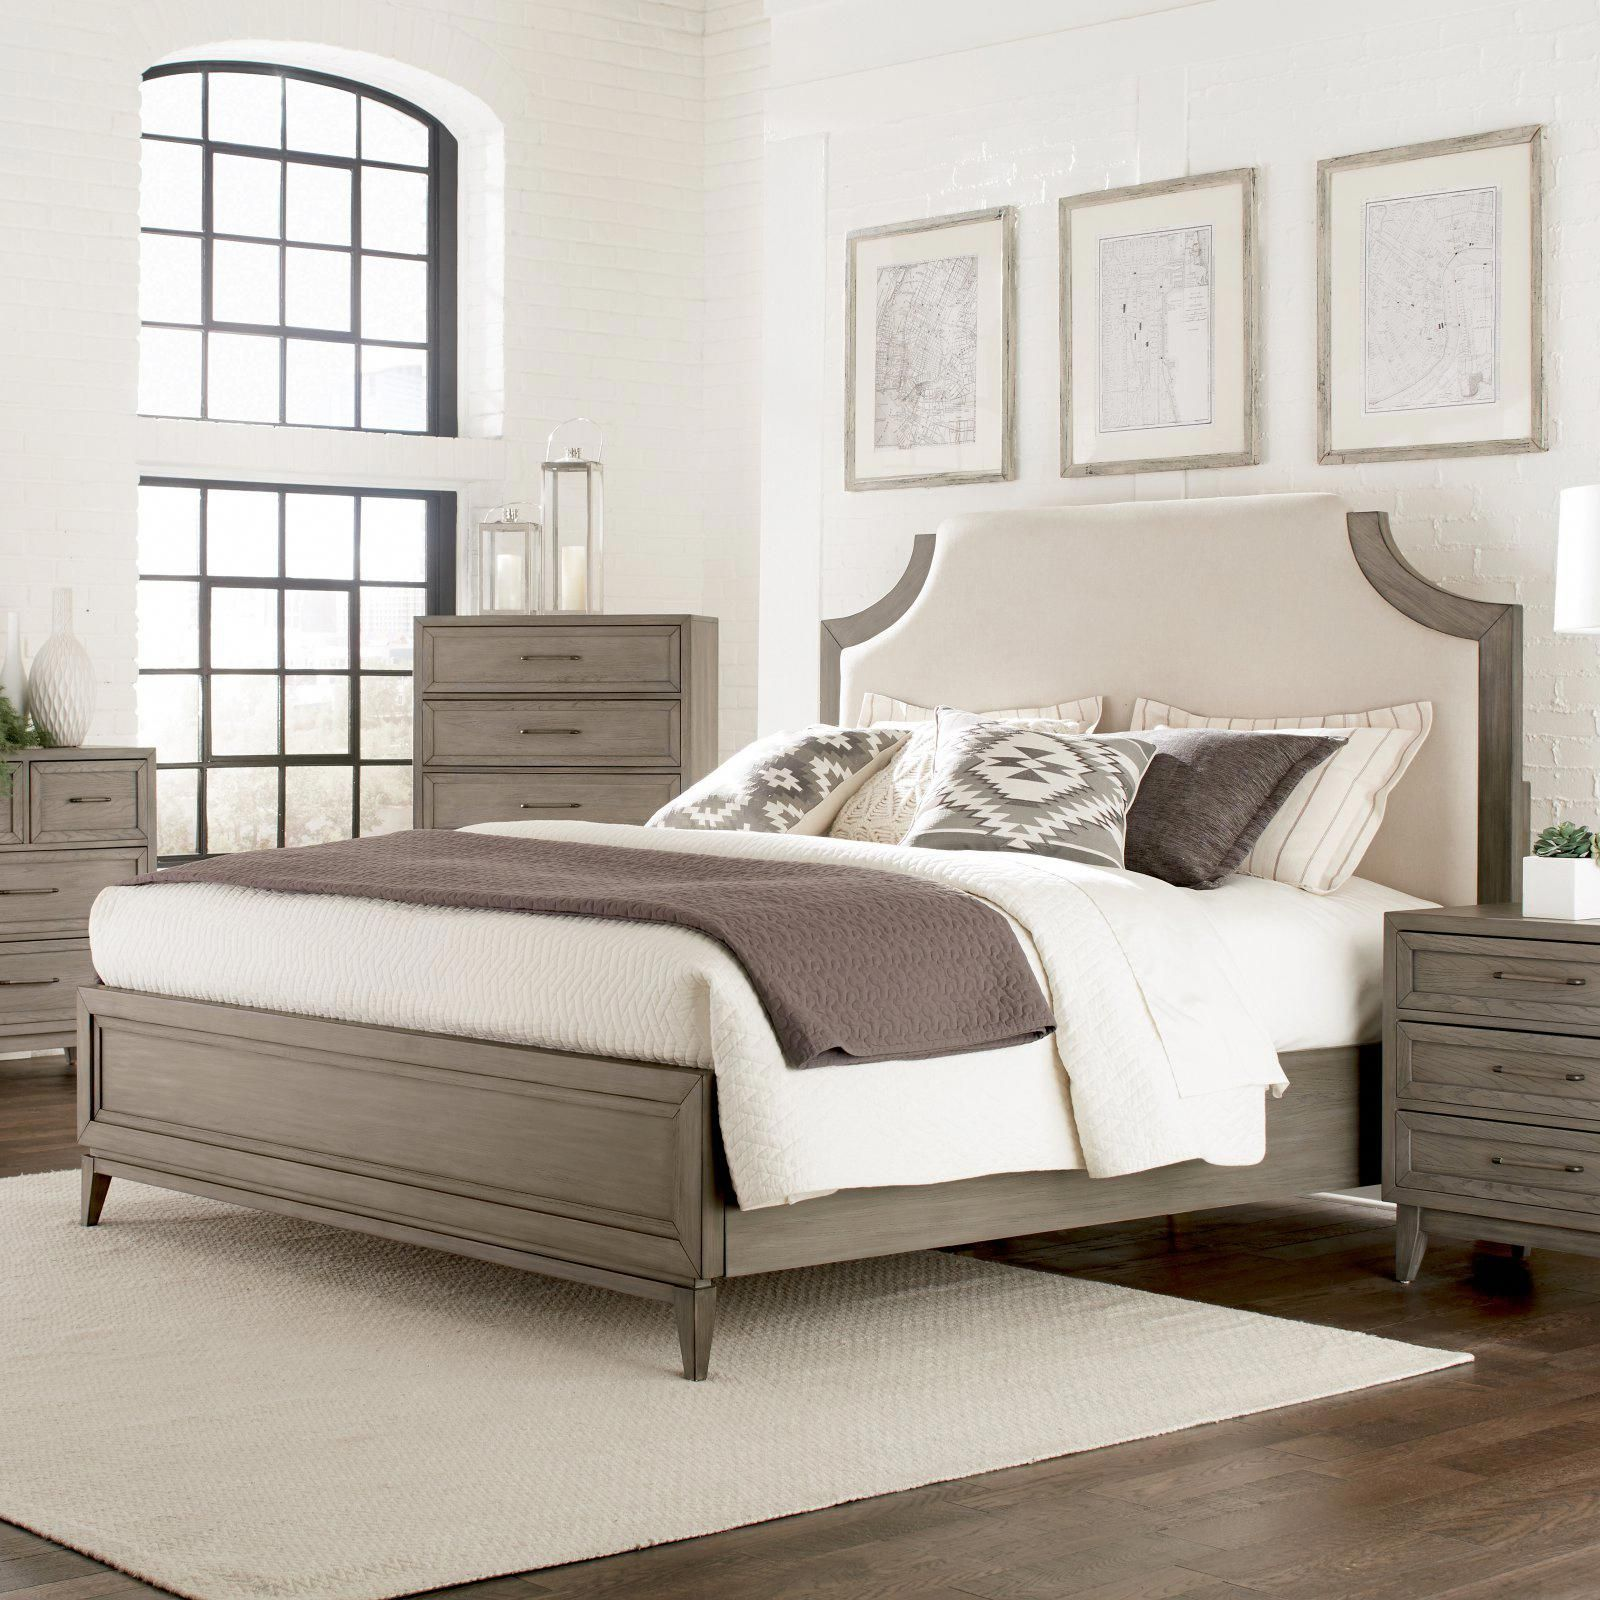 Riverside furniture vogue upholstered bed size queen